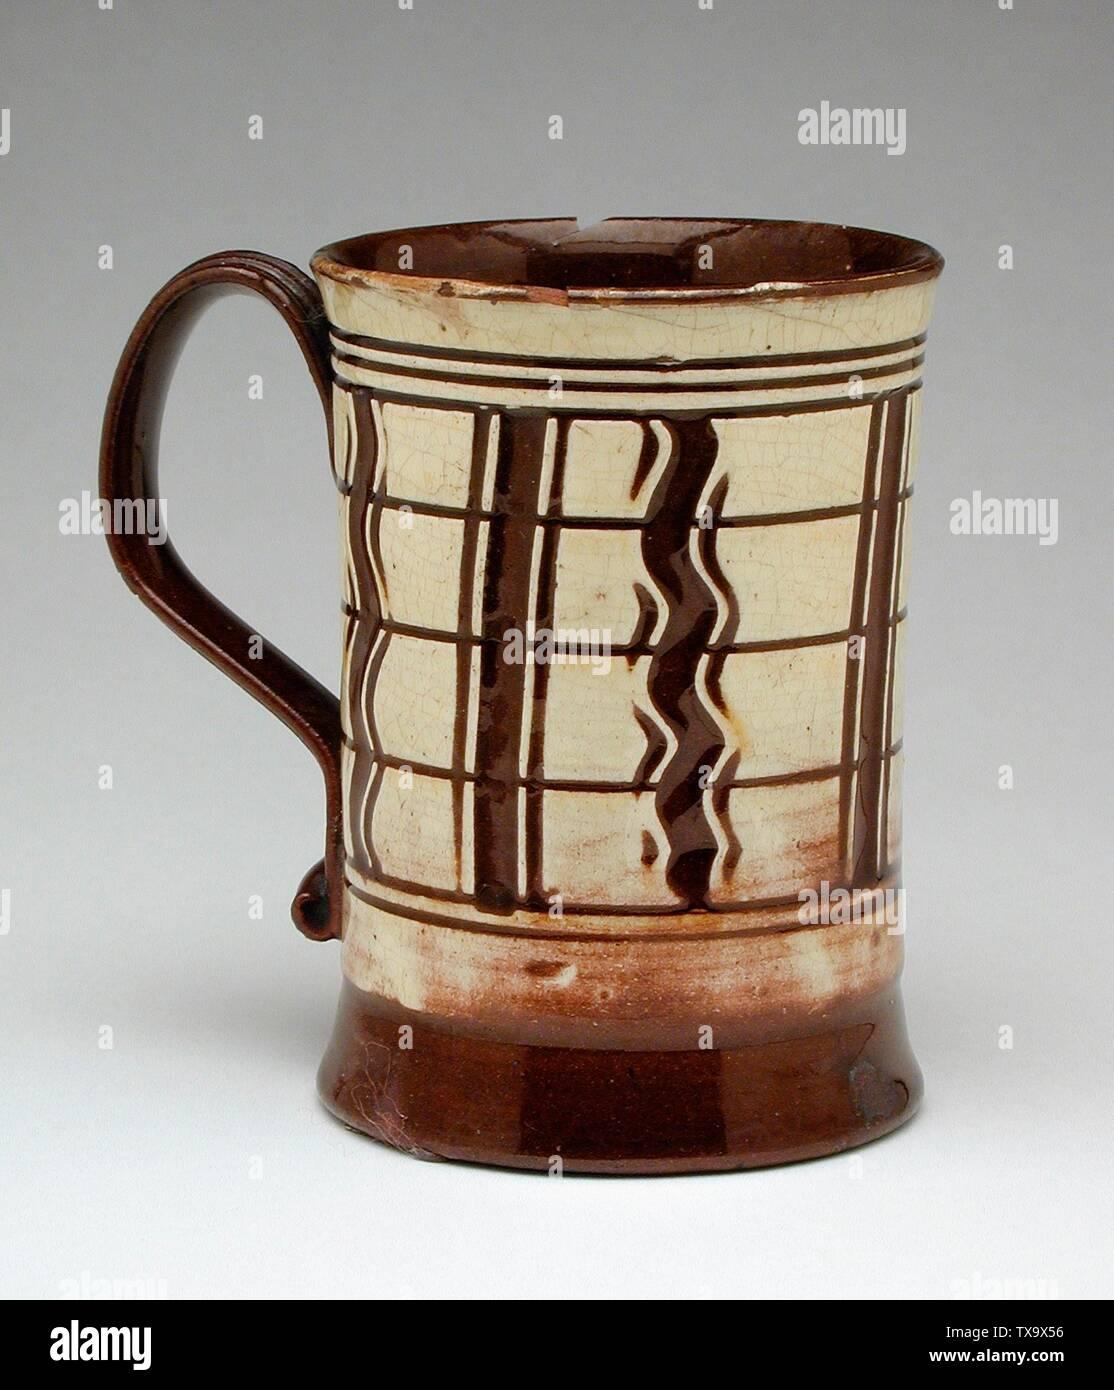 'Mug; English:  England, circa 1740 Furnishings; Serviceware Earthenware (slipware) Decorative Arts Council Fund (M.89.124) Decorative Arts and Design; circa 1740 date QS:P571,+1740-00-00T00:00:00Z/9,P1480,Q5727902; ' - Stock Image